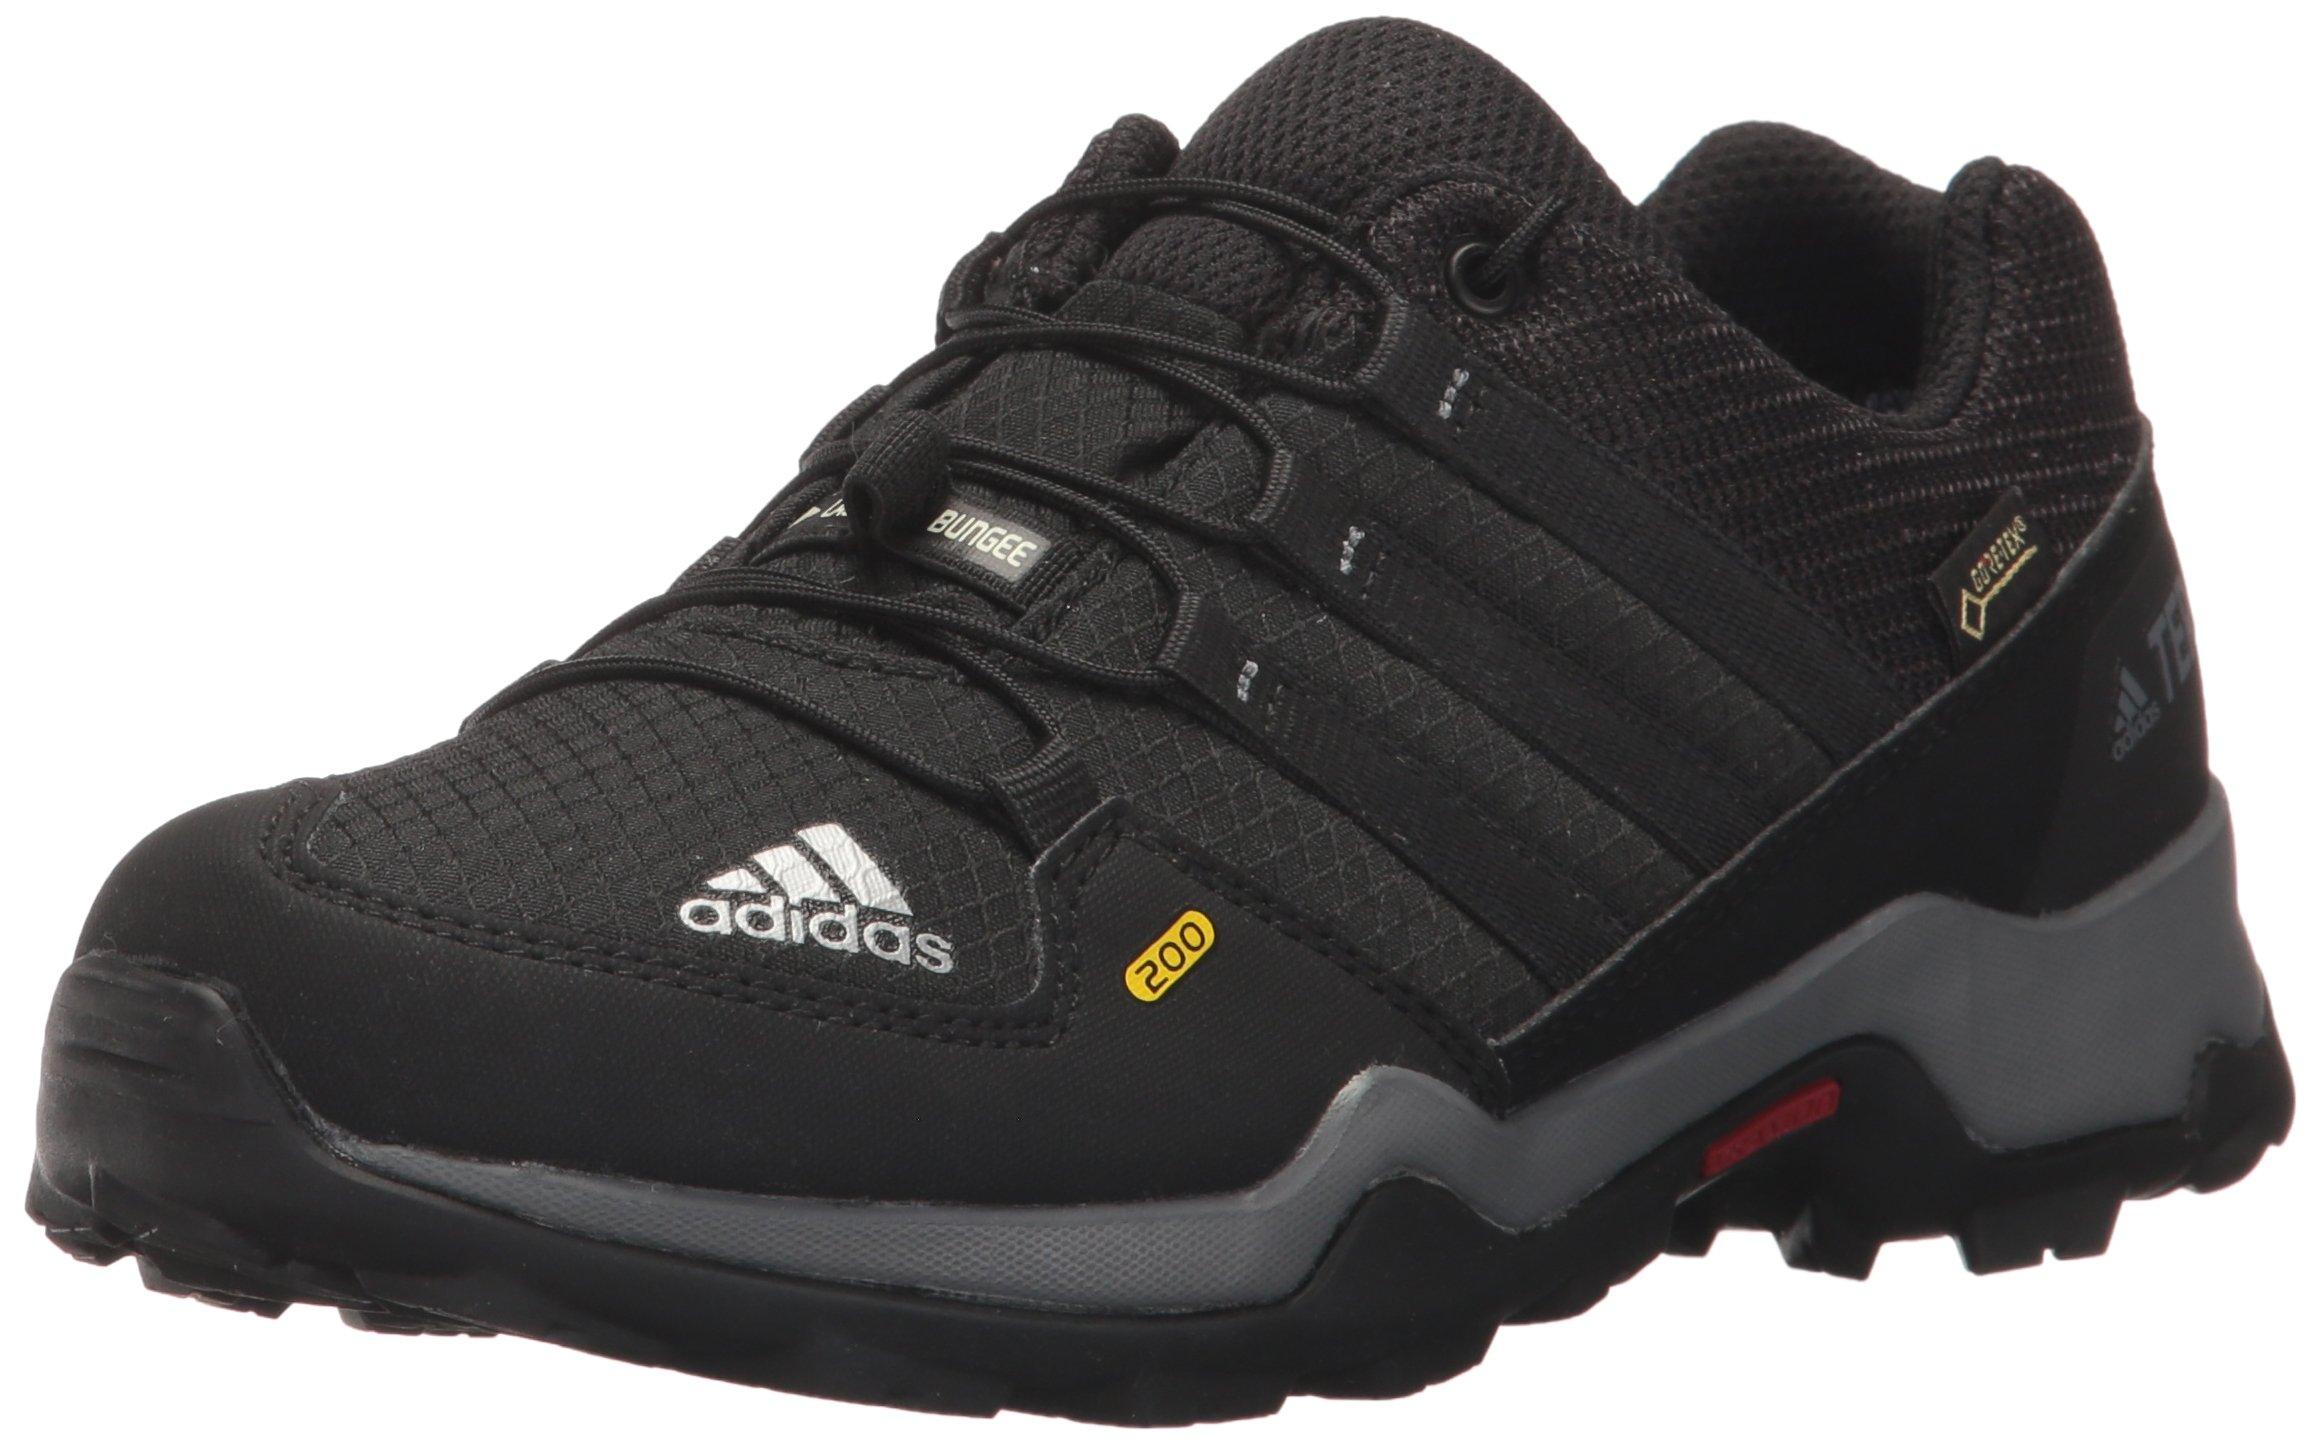 adidas outdoor Terrex Gore-Tex Hiking Shoe Black/Vista Grey, 3.5 Child US Big Kid